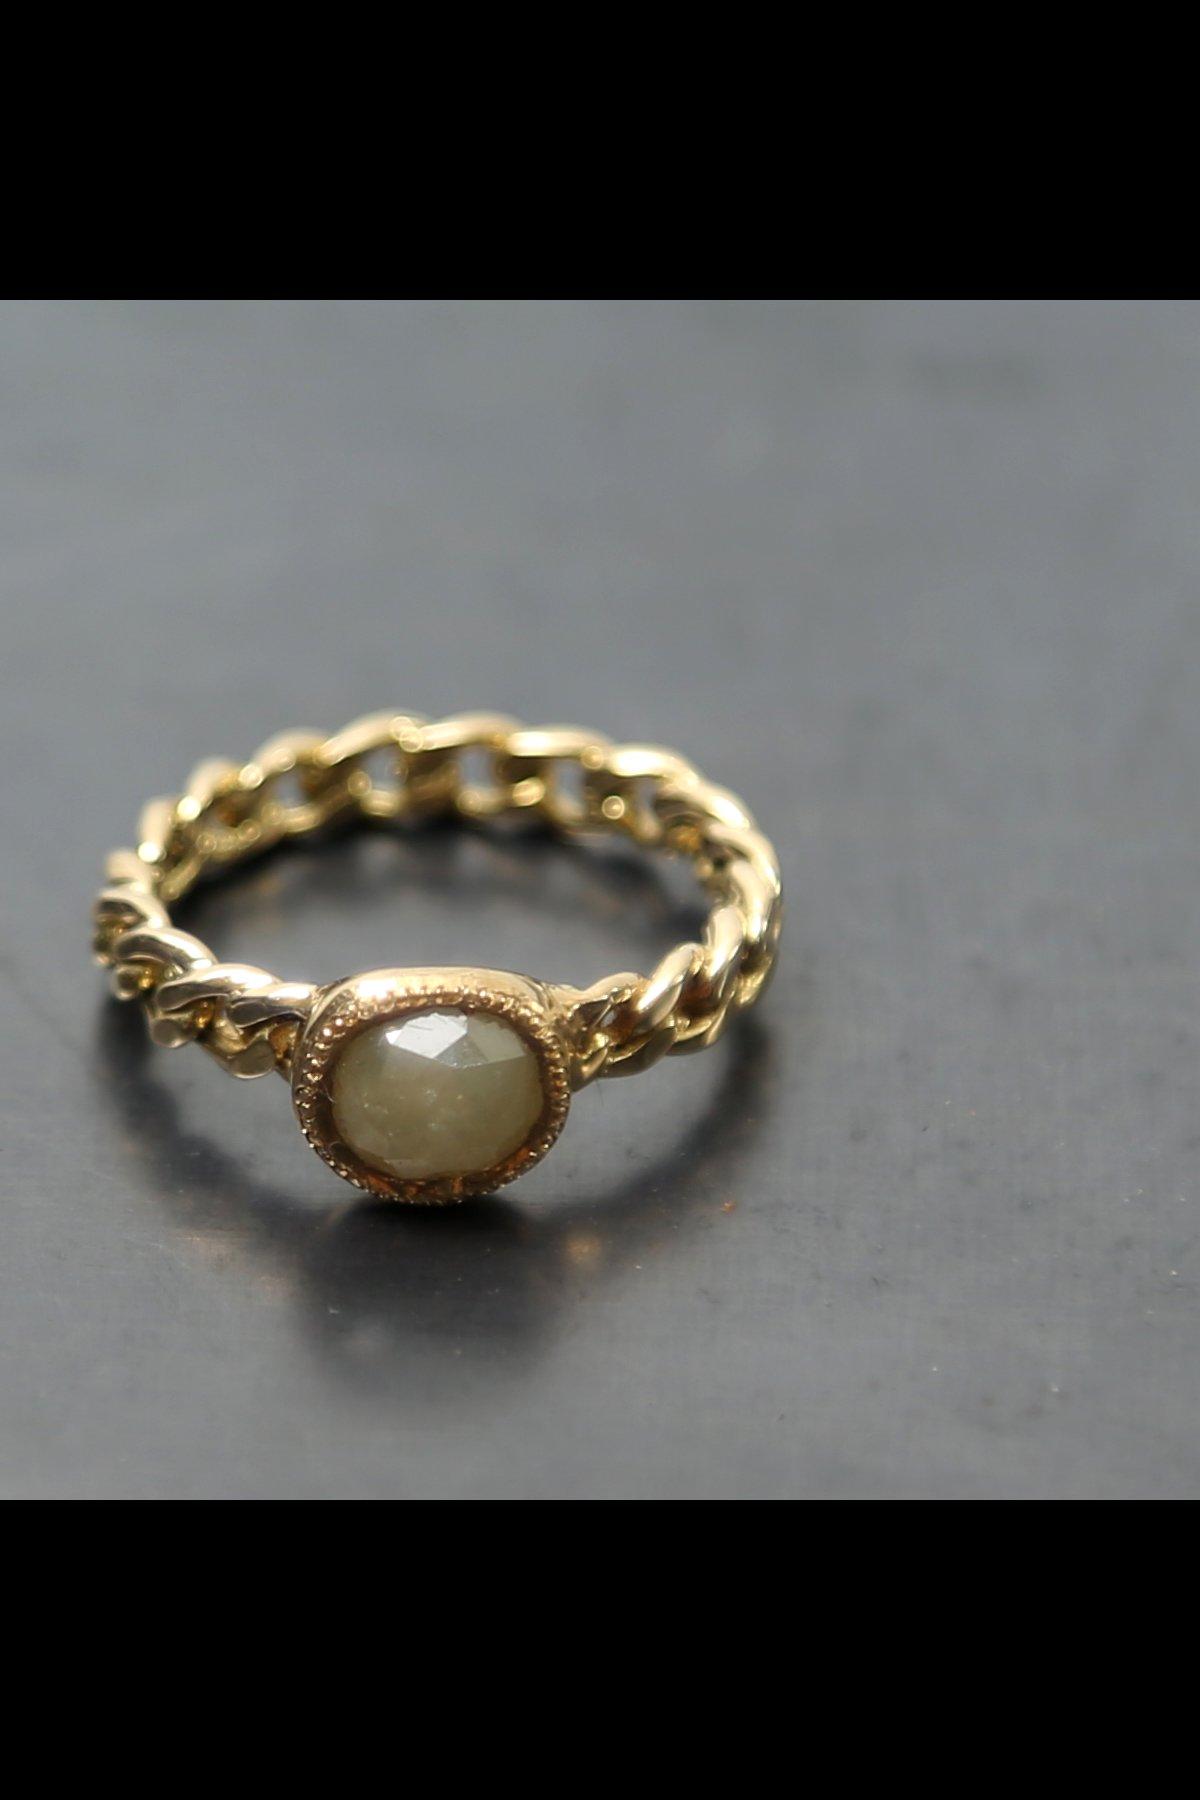 CLASSIC CHAIN DIAMOND RING N.8A-ODR4